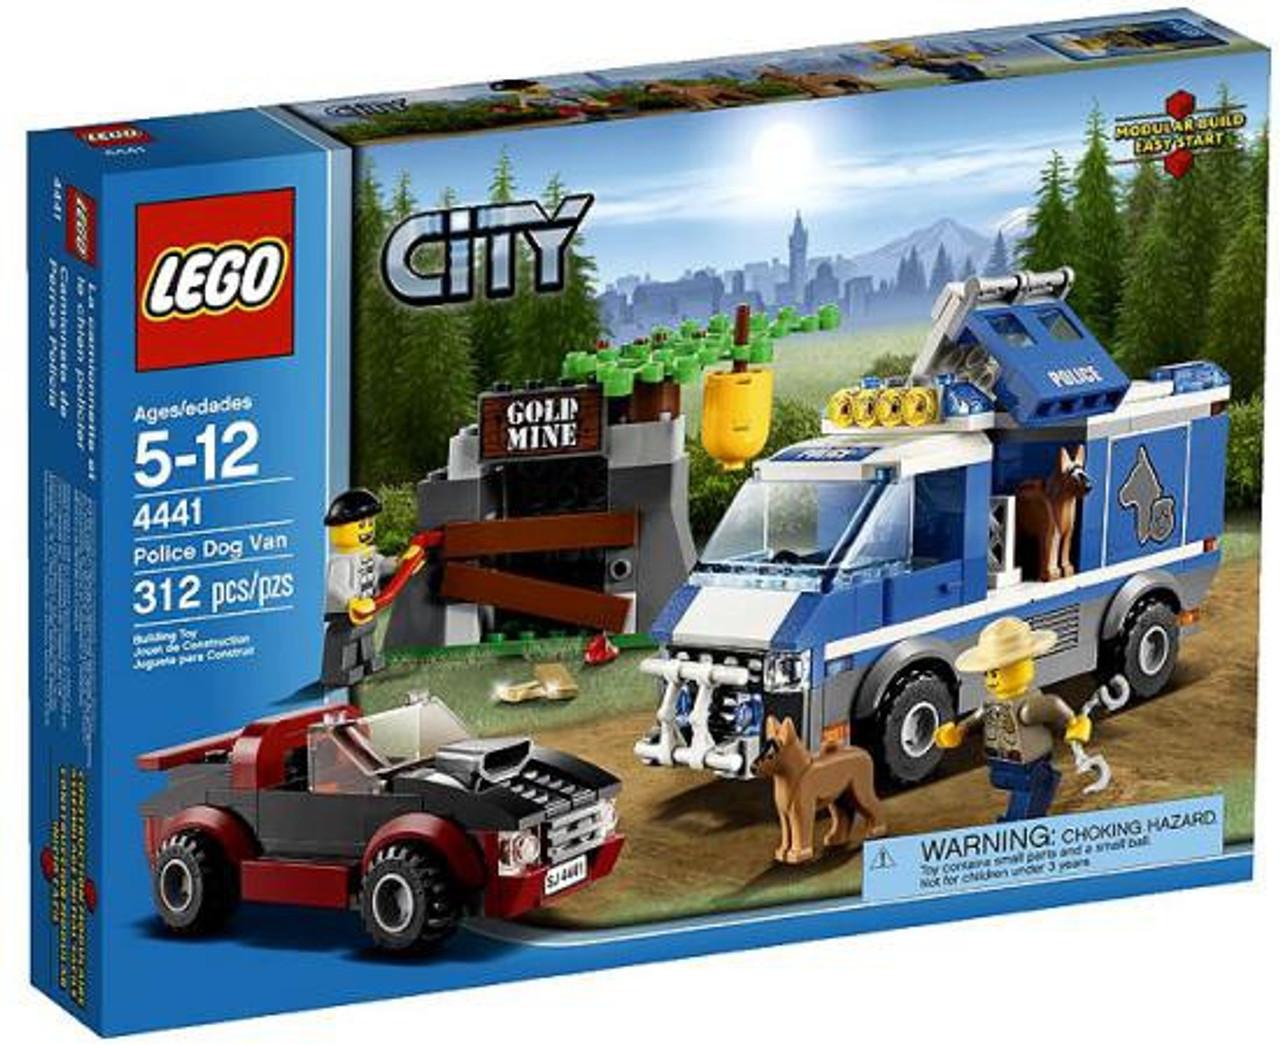 Lego City Police Dog Van Set 4441 Toywiz